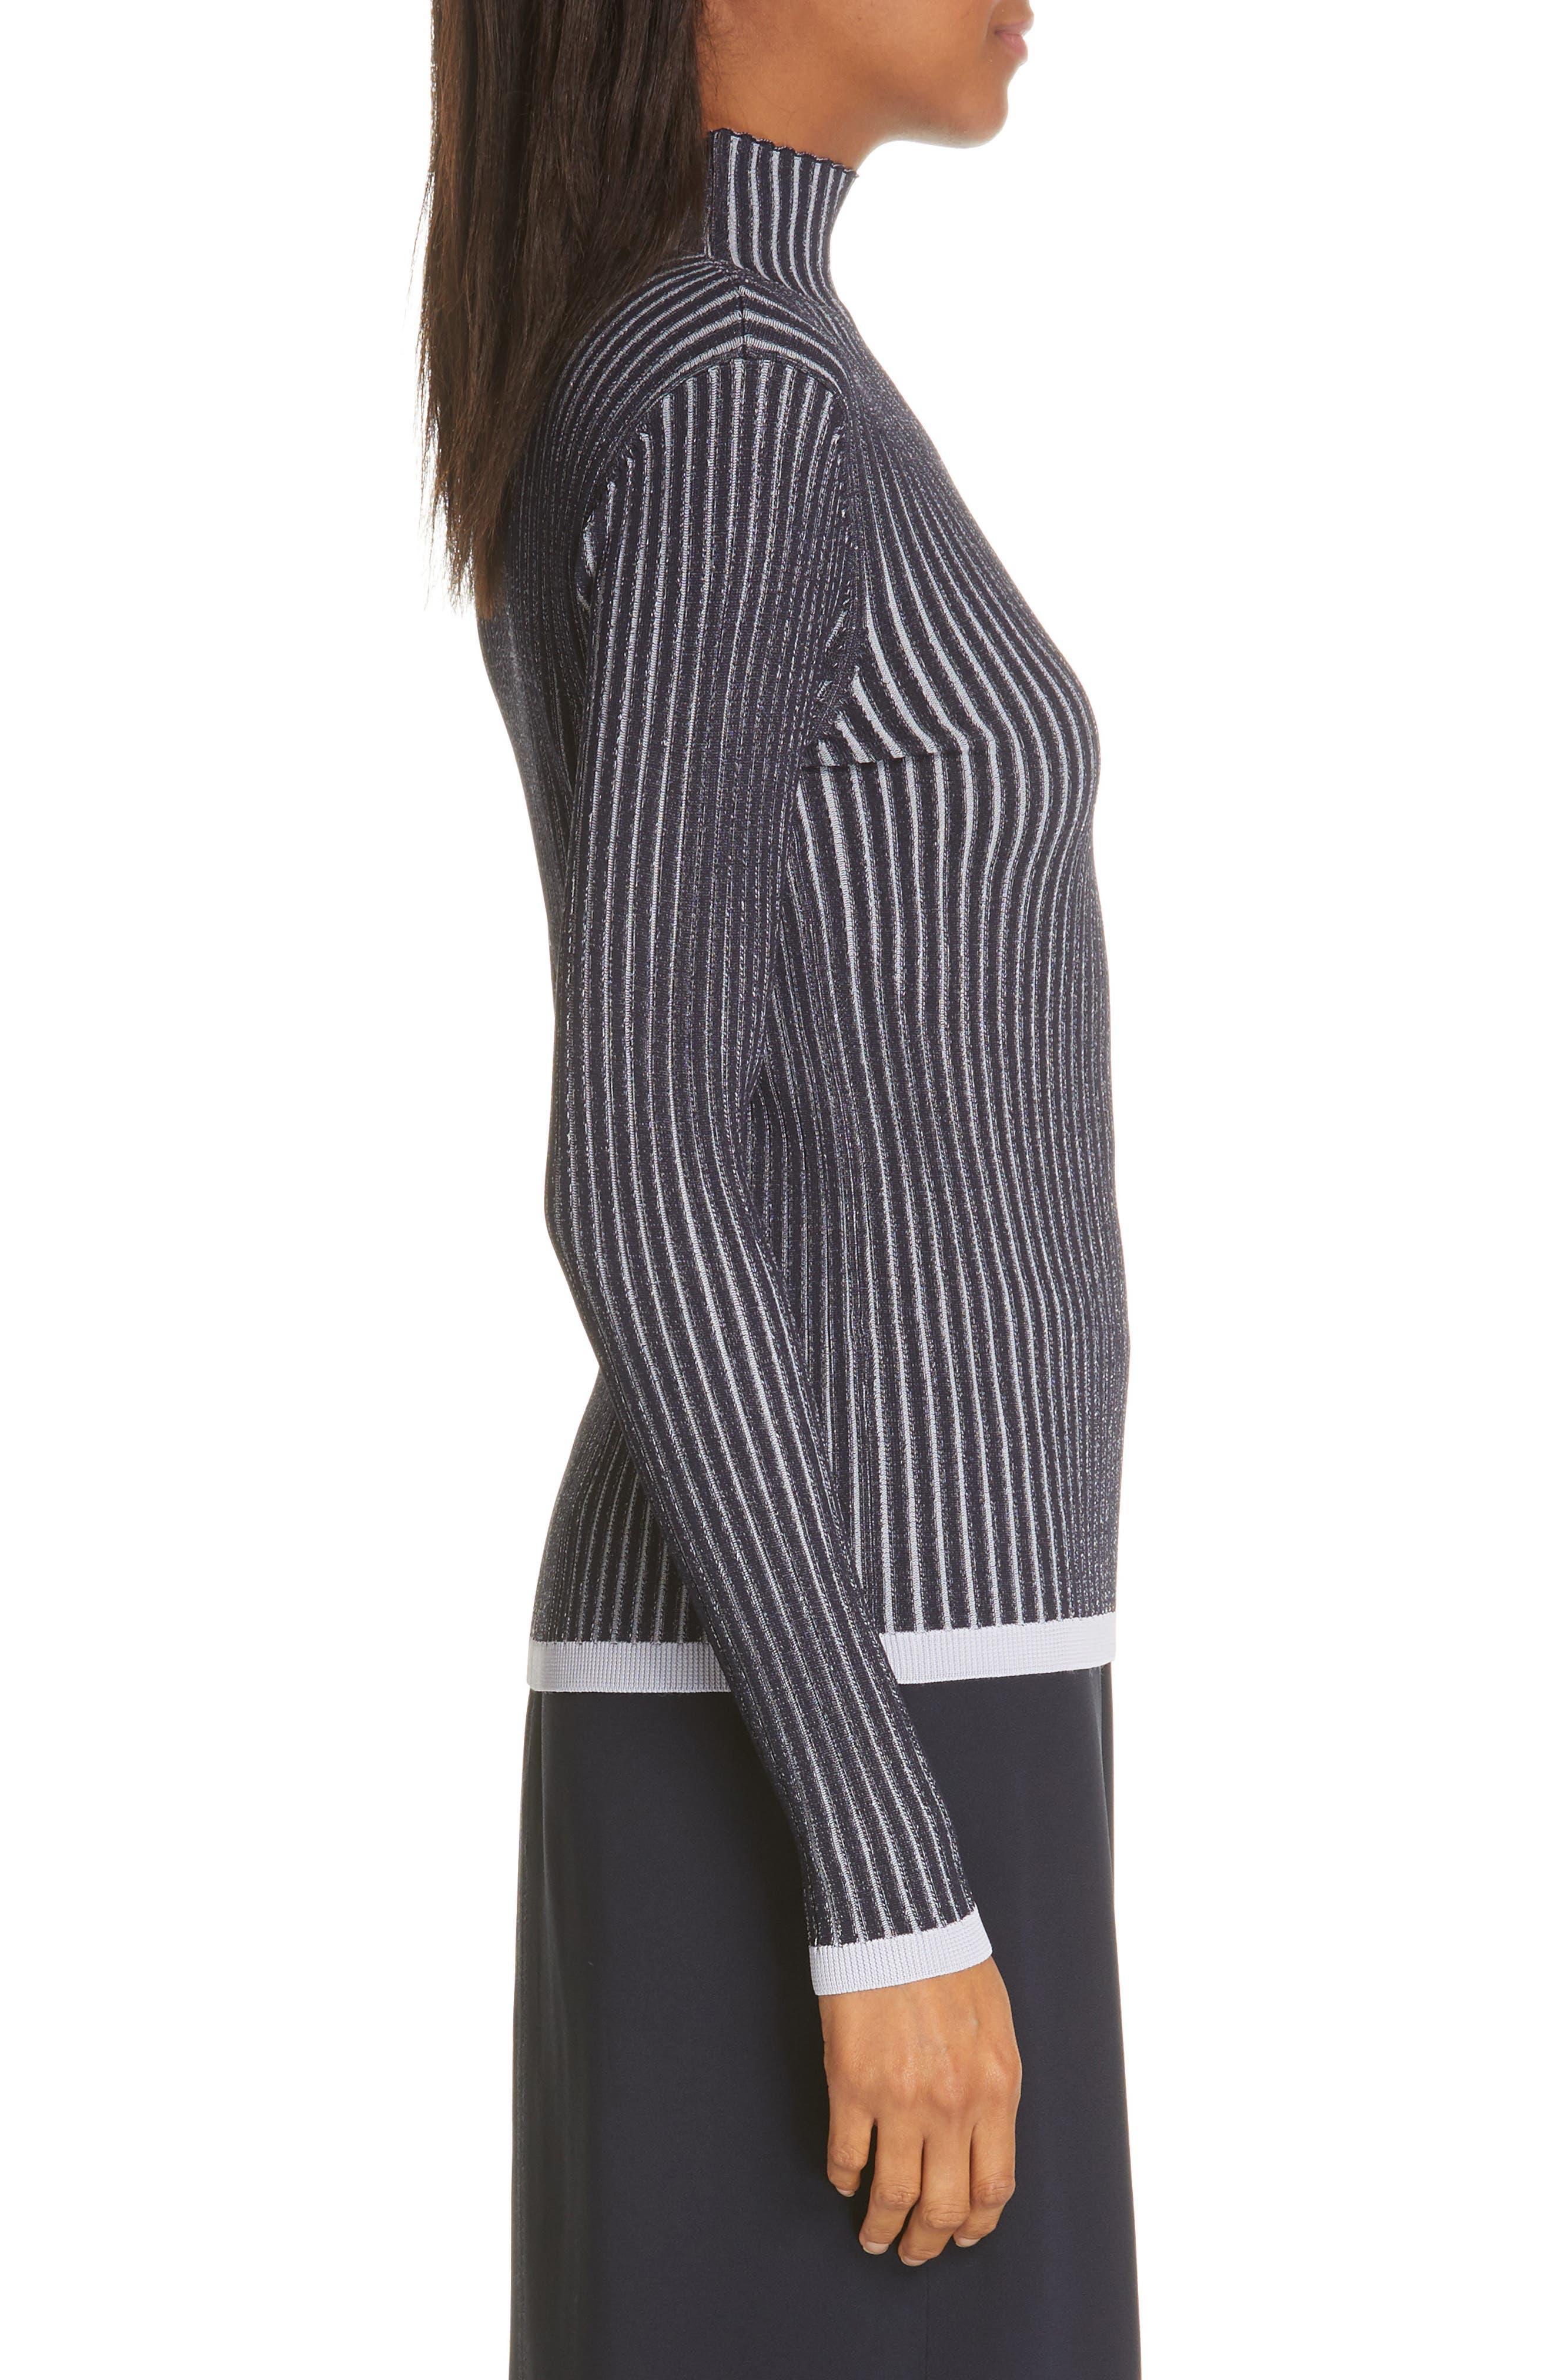 LEWIT, Stripe Ribbed Mock Neck Sweater, Alternate thumbnail 3, color, NAVY ICELANDIC STRIPE